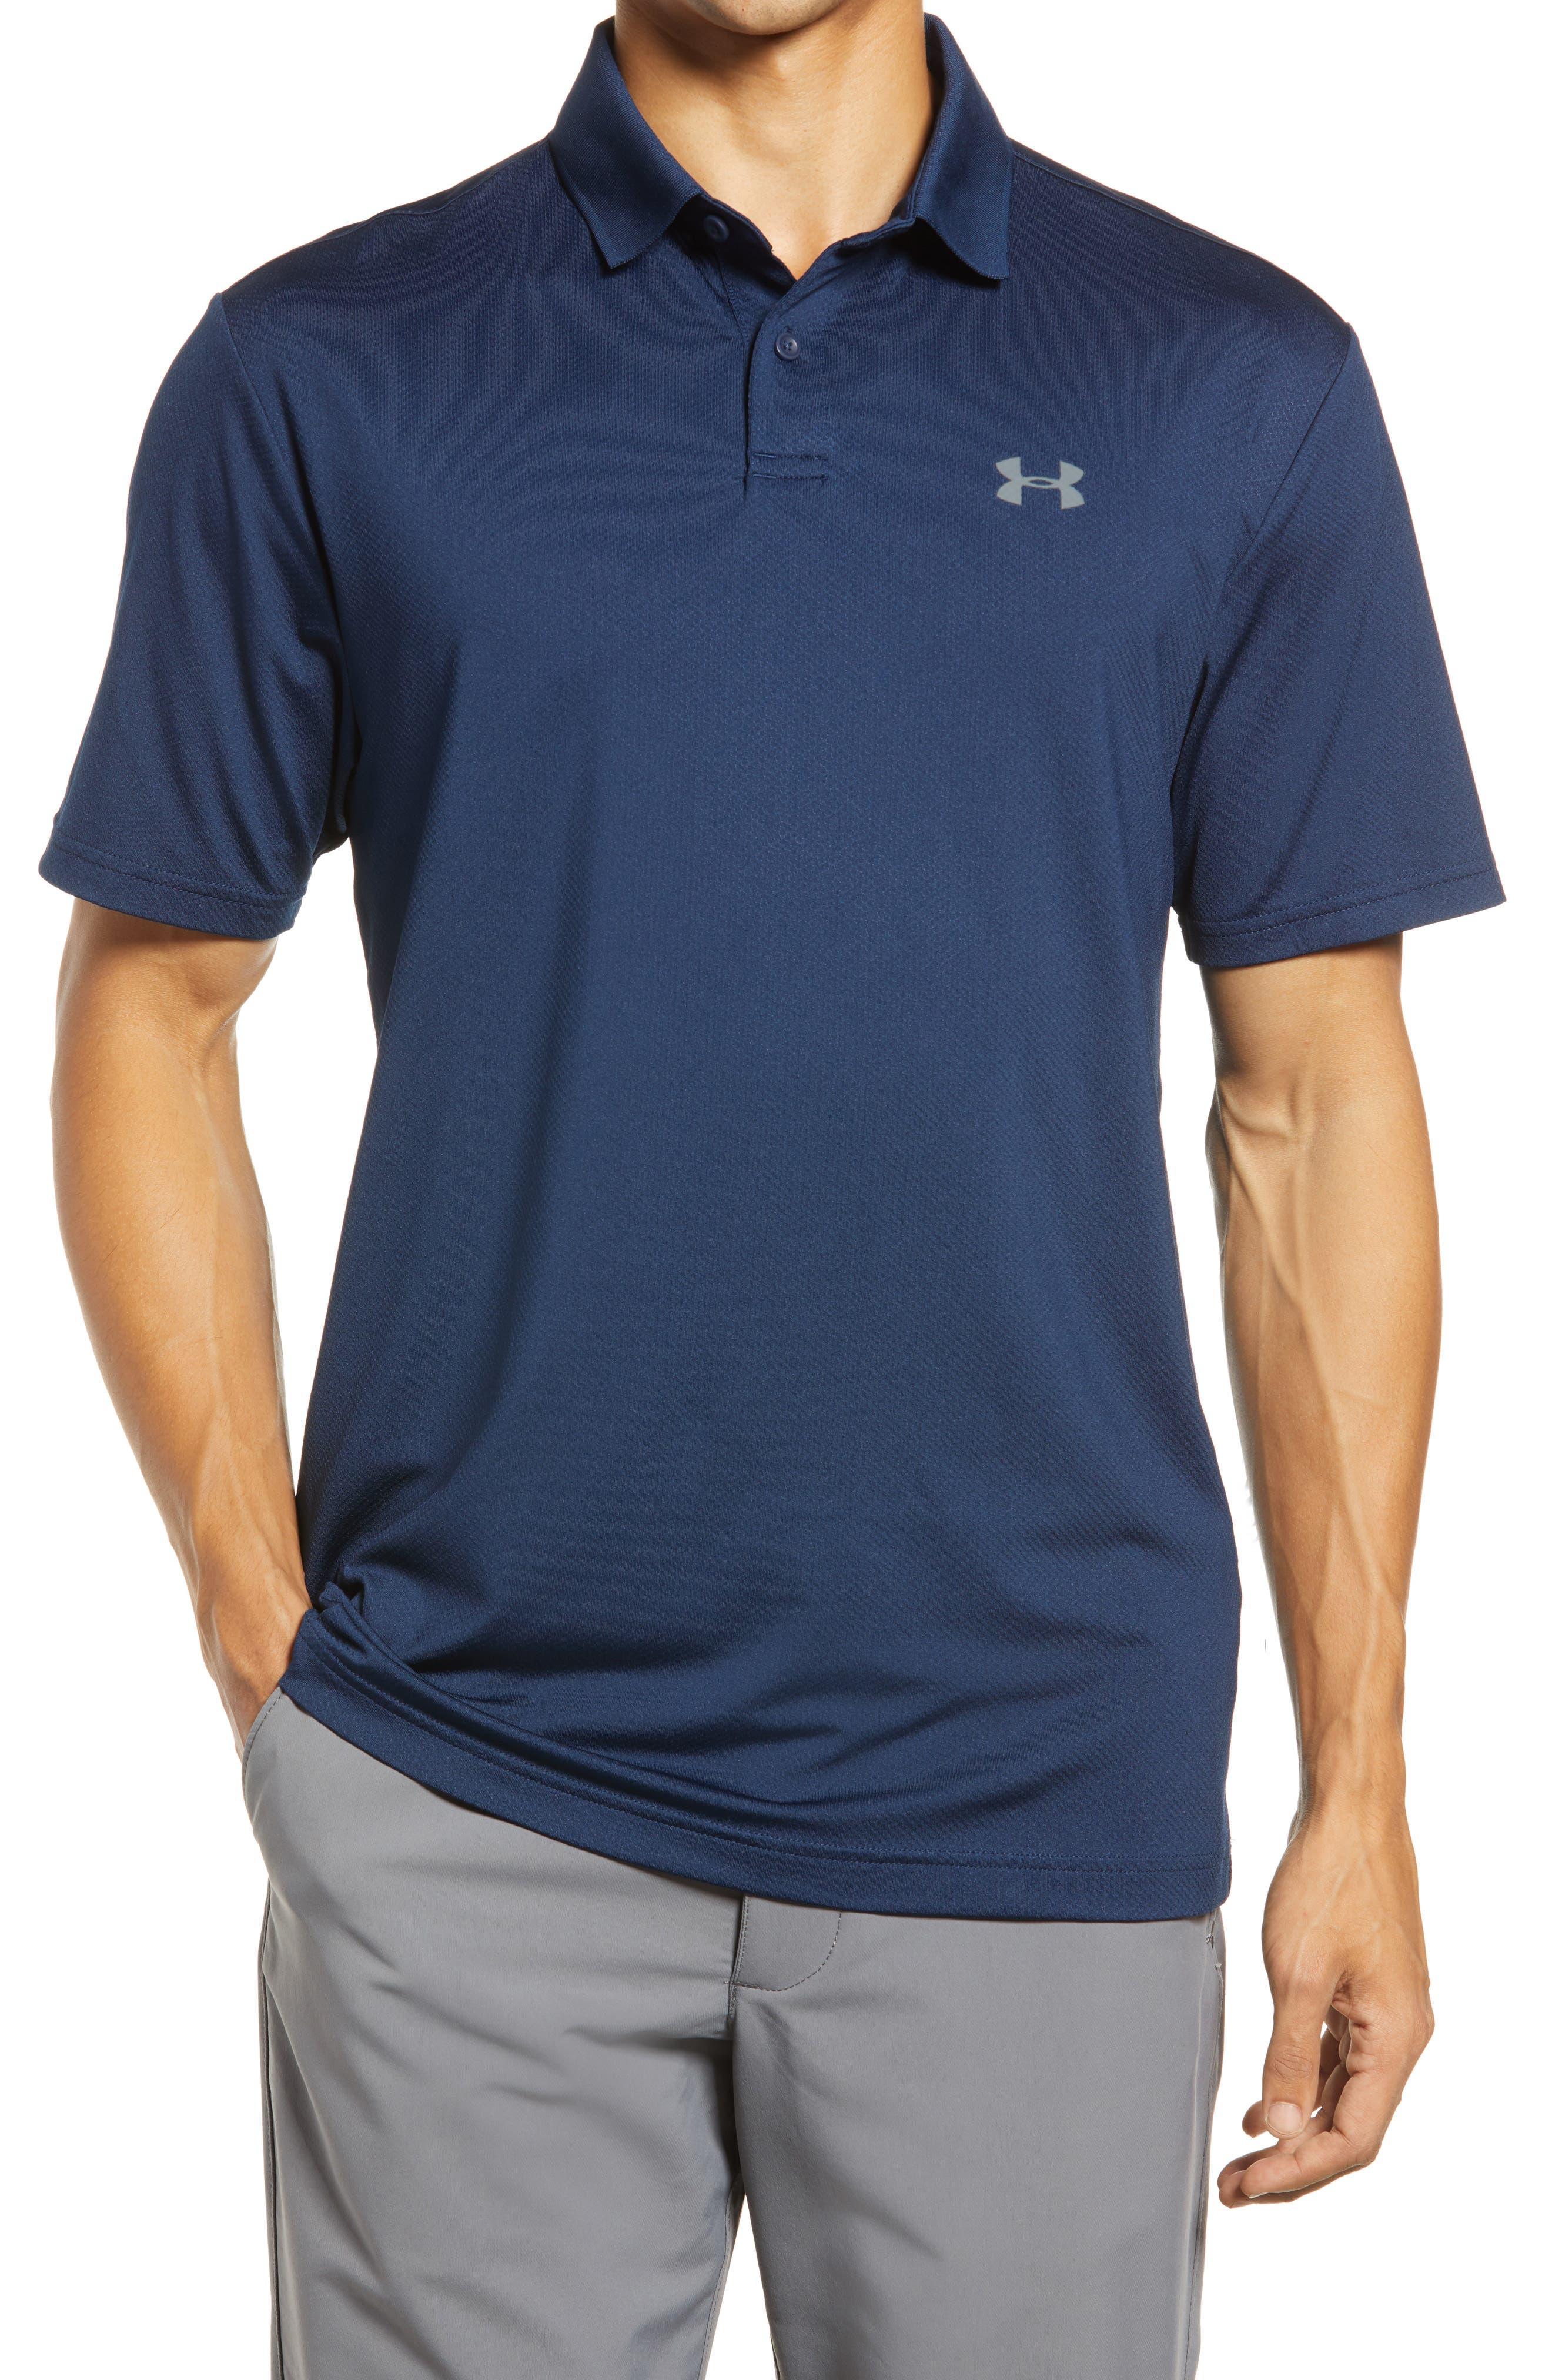 Men's Polo Shirts | Nordstrom